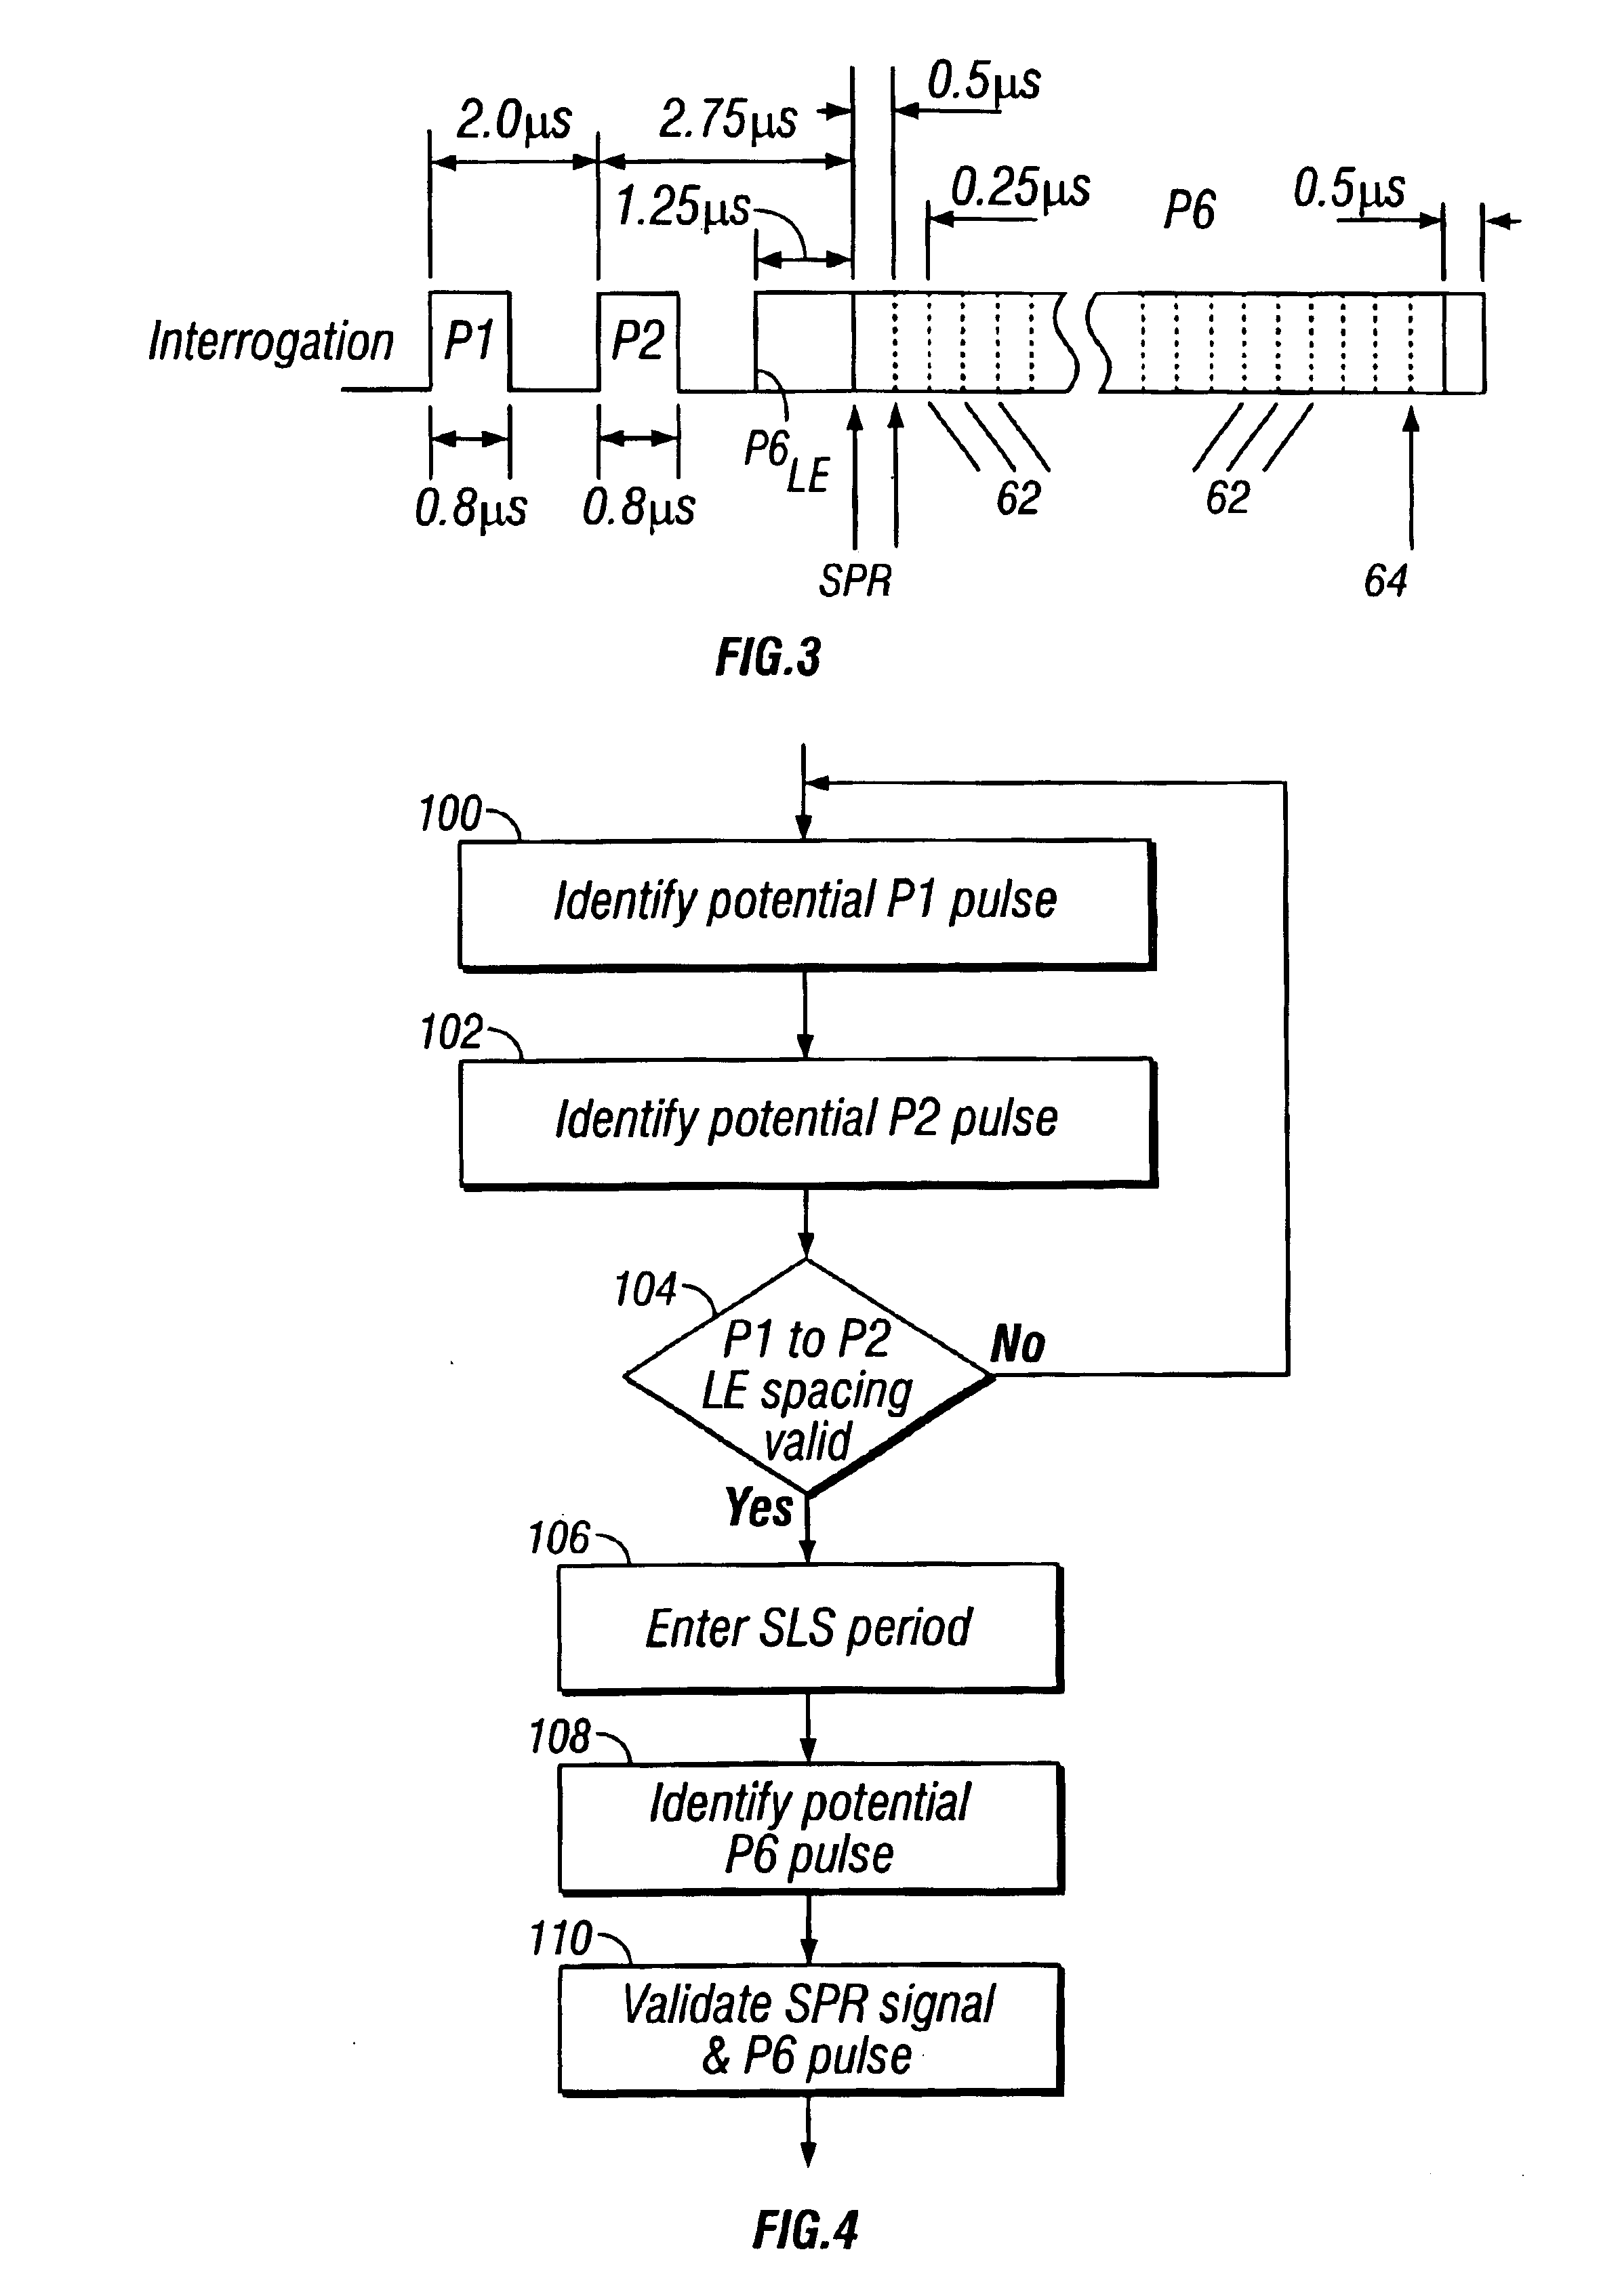 ads l400 speaker wiring diagram mode s transponder block diagram | wiring library ads b receiver block diagram